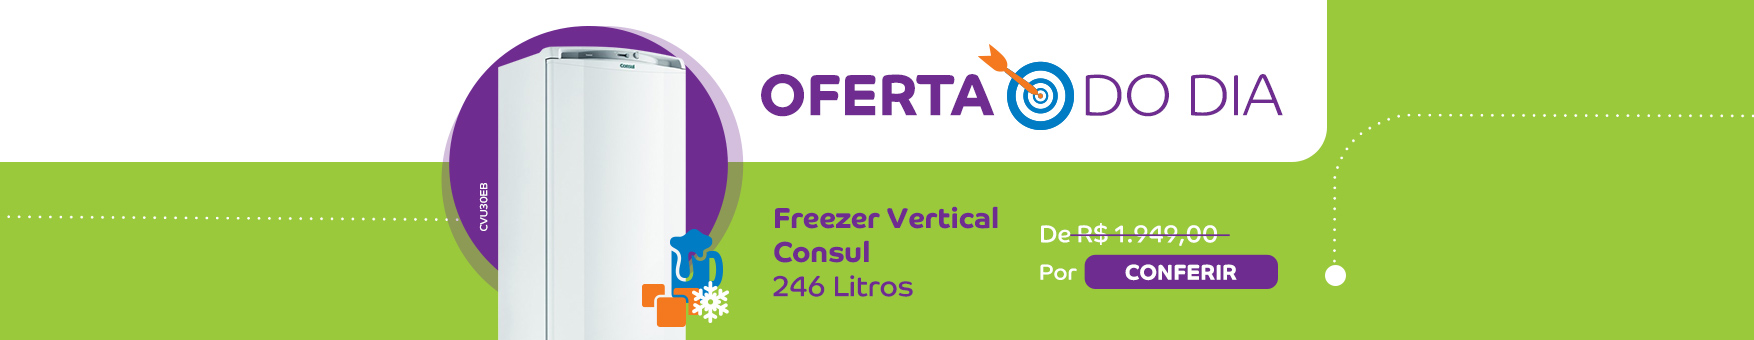 Promoção Interna - 22 - ofertasdodia - cvu30eb - 3